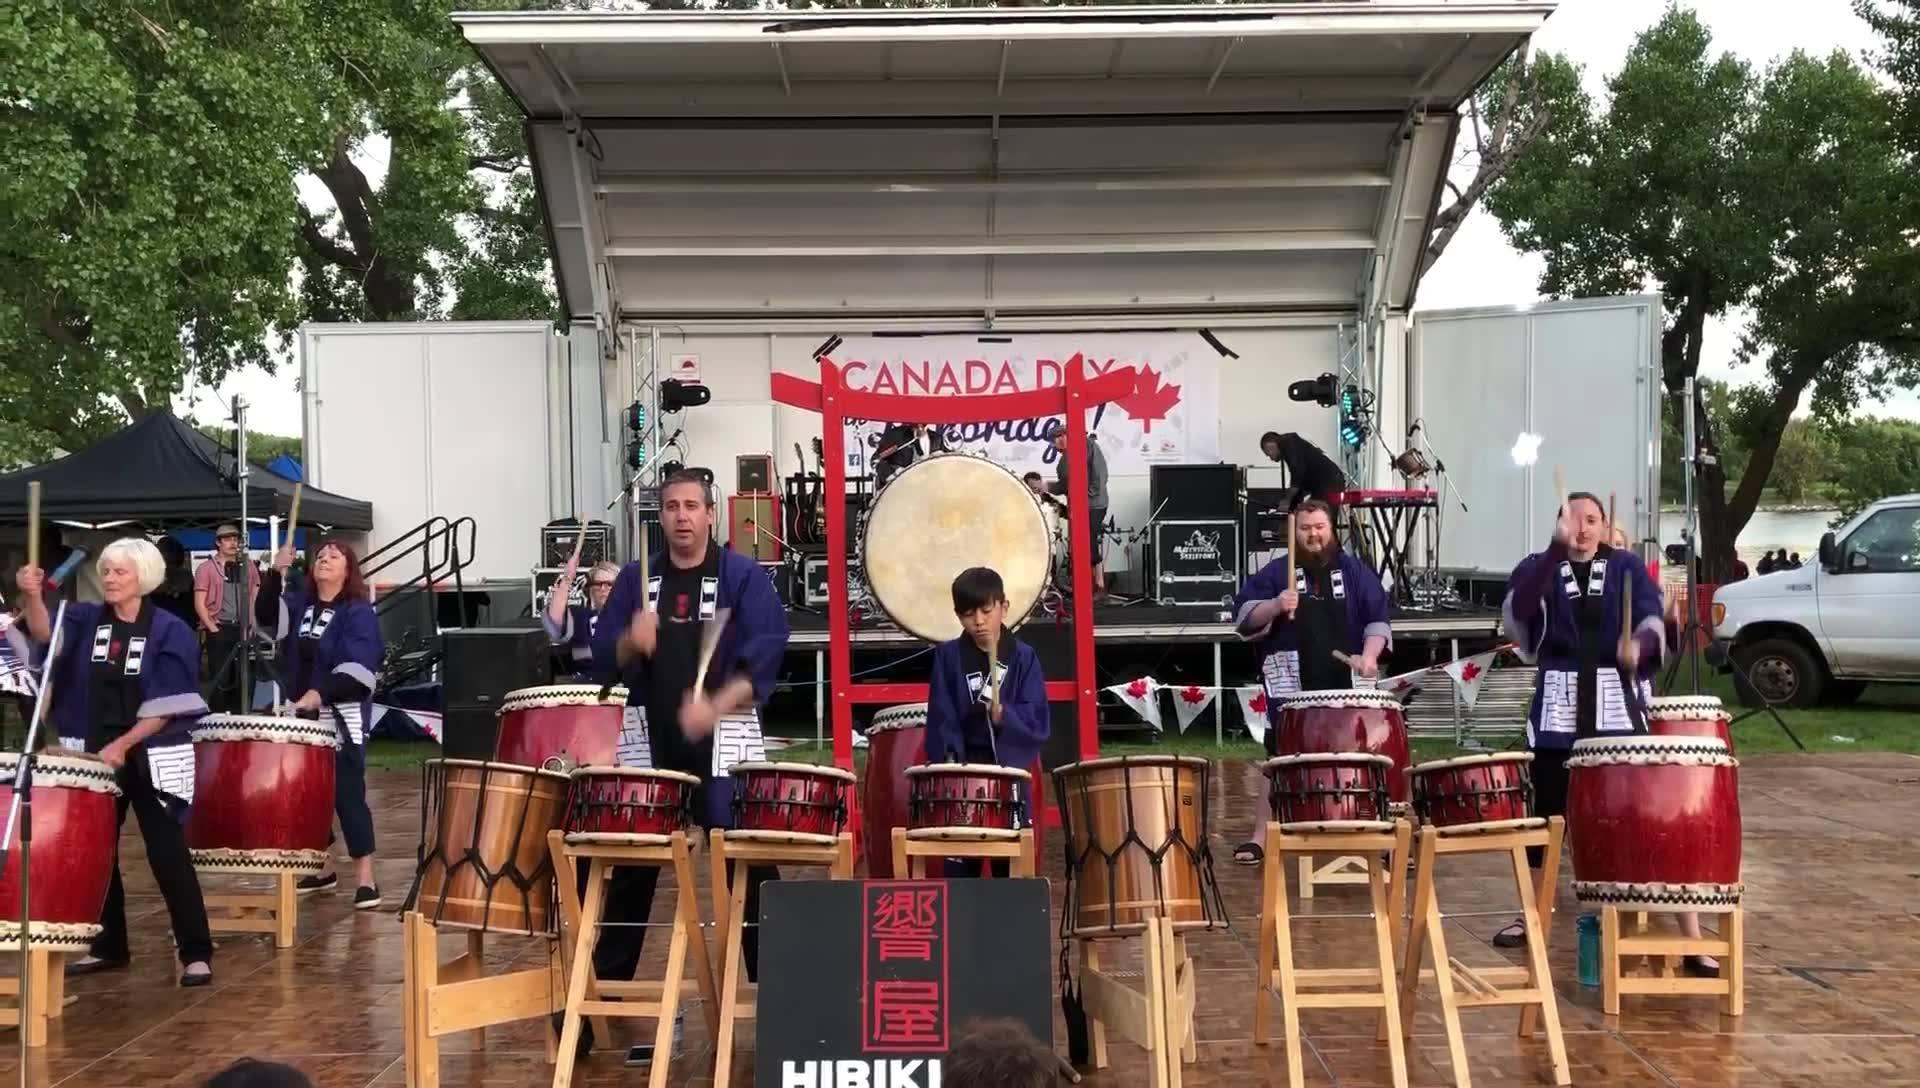 Canada Day Lethbridge!